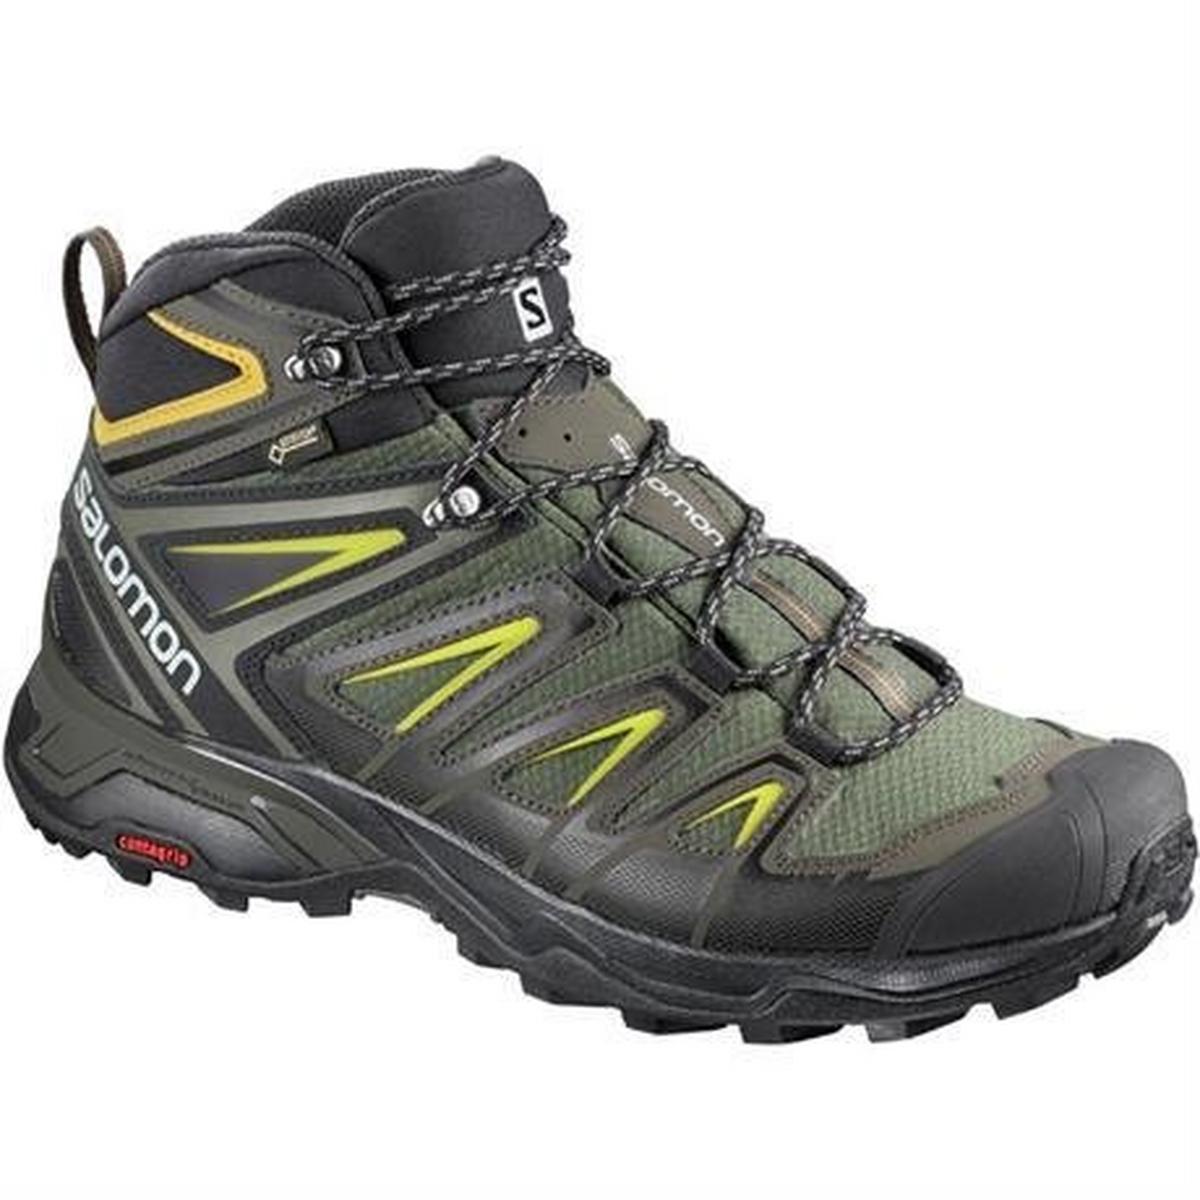 Salomon Boots Men's X Ultra 3 Mid GTX Castor Grey/Black/Green Sulphur